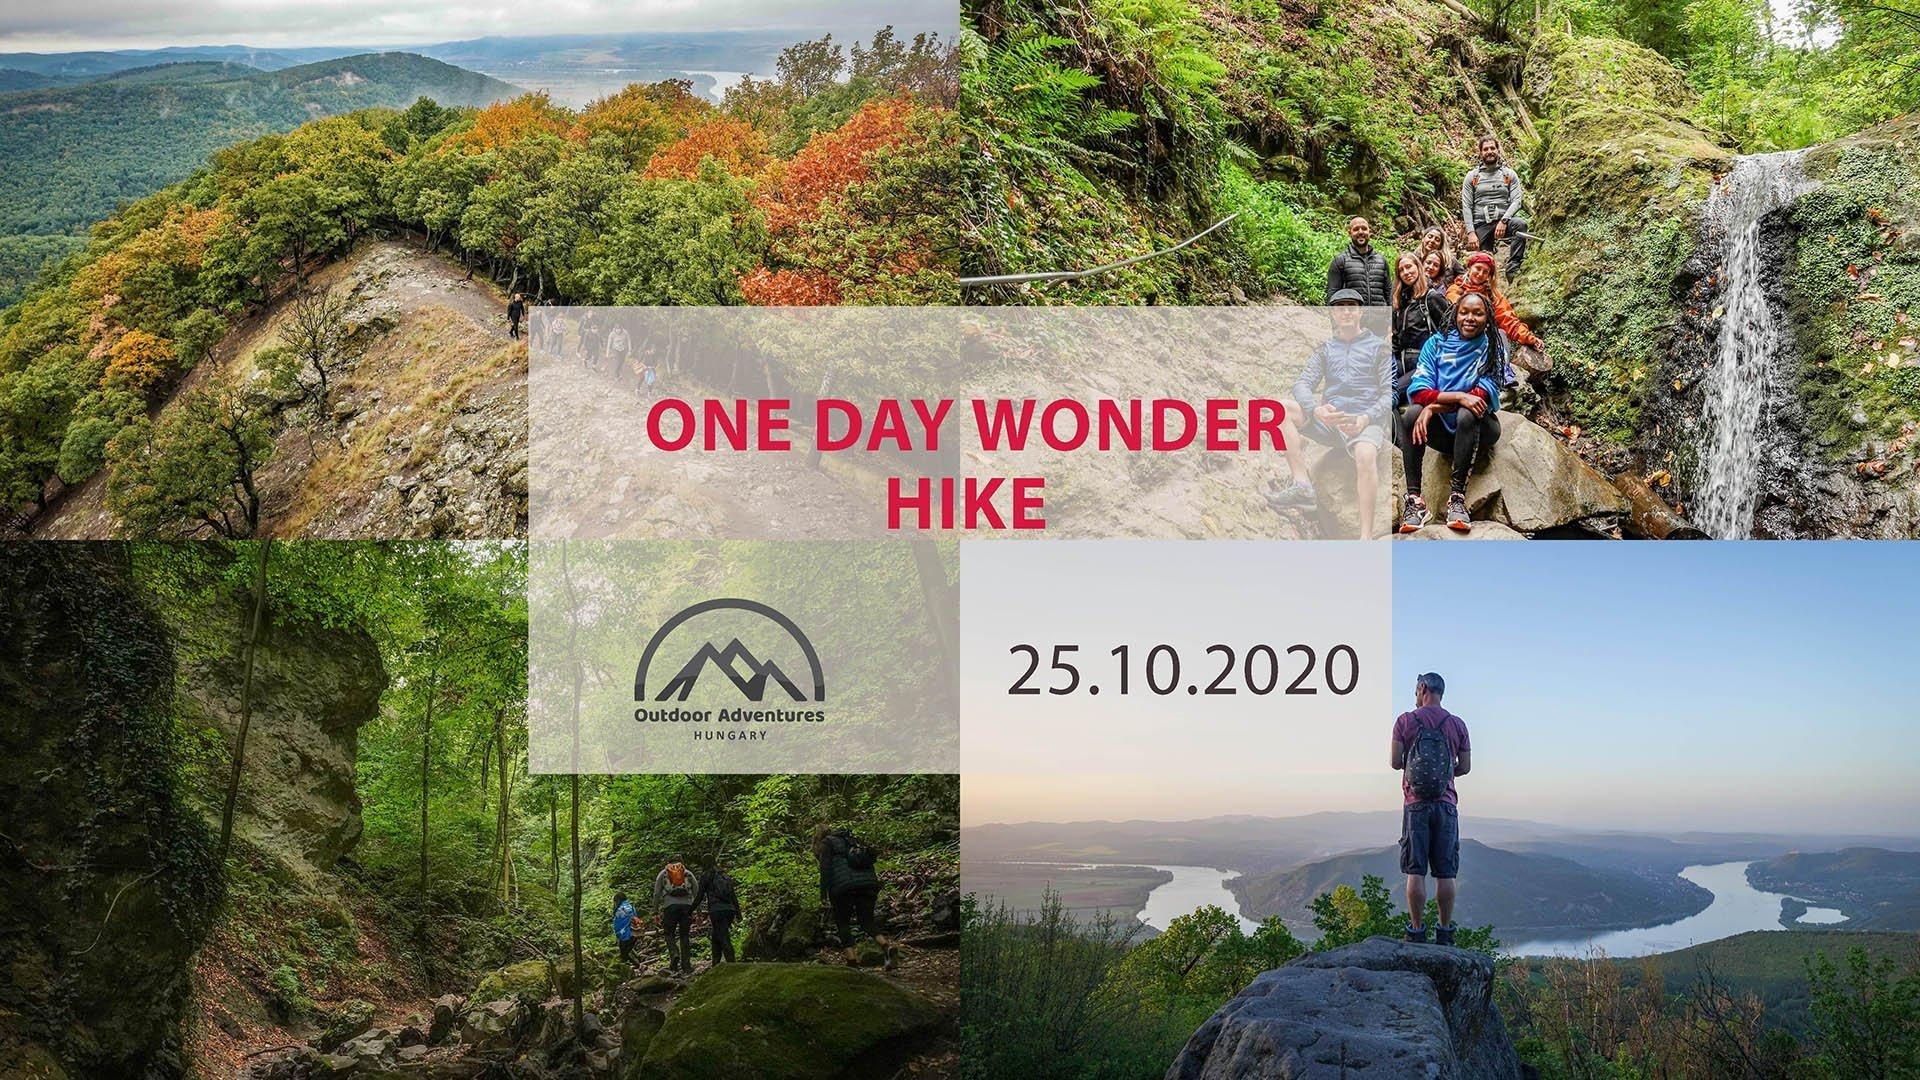 One Day Wonder Hike